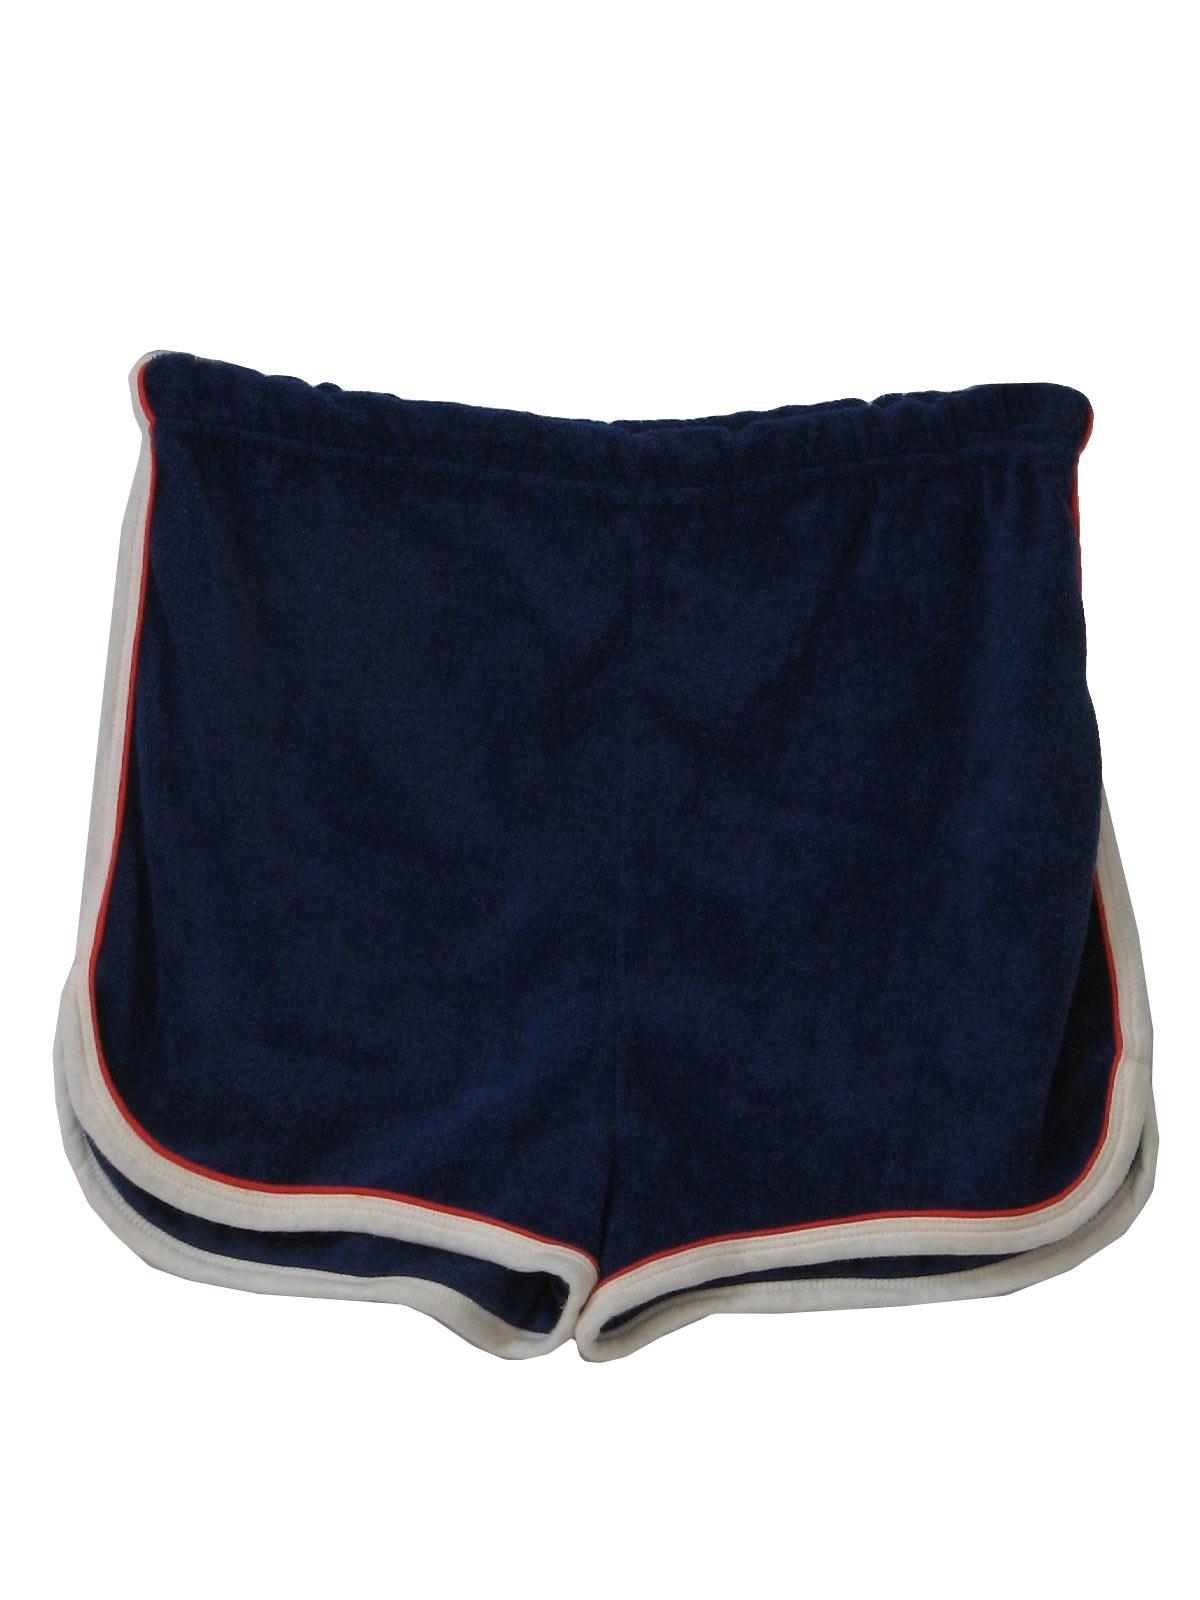 1970 S Retro Shorts 70s Pillow Talk Mens Dark Blue